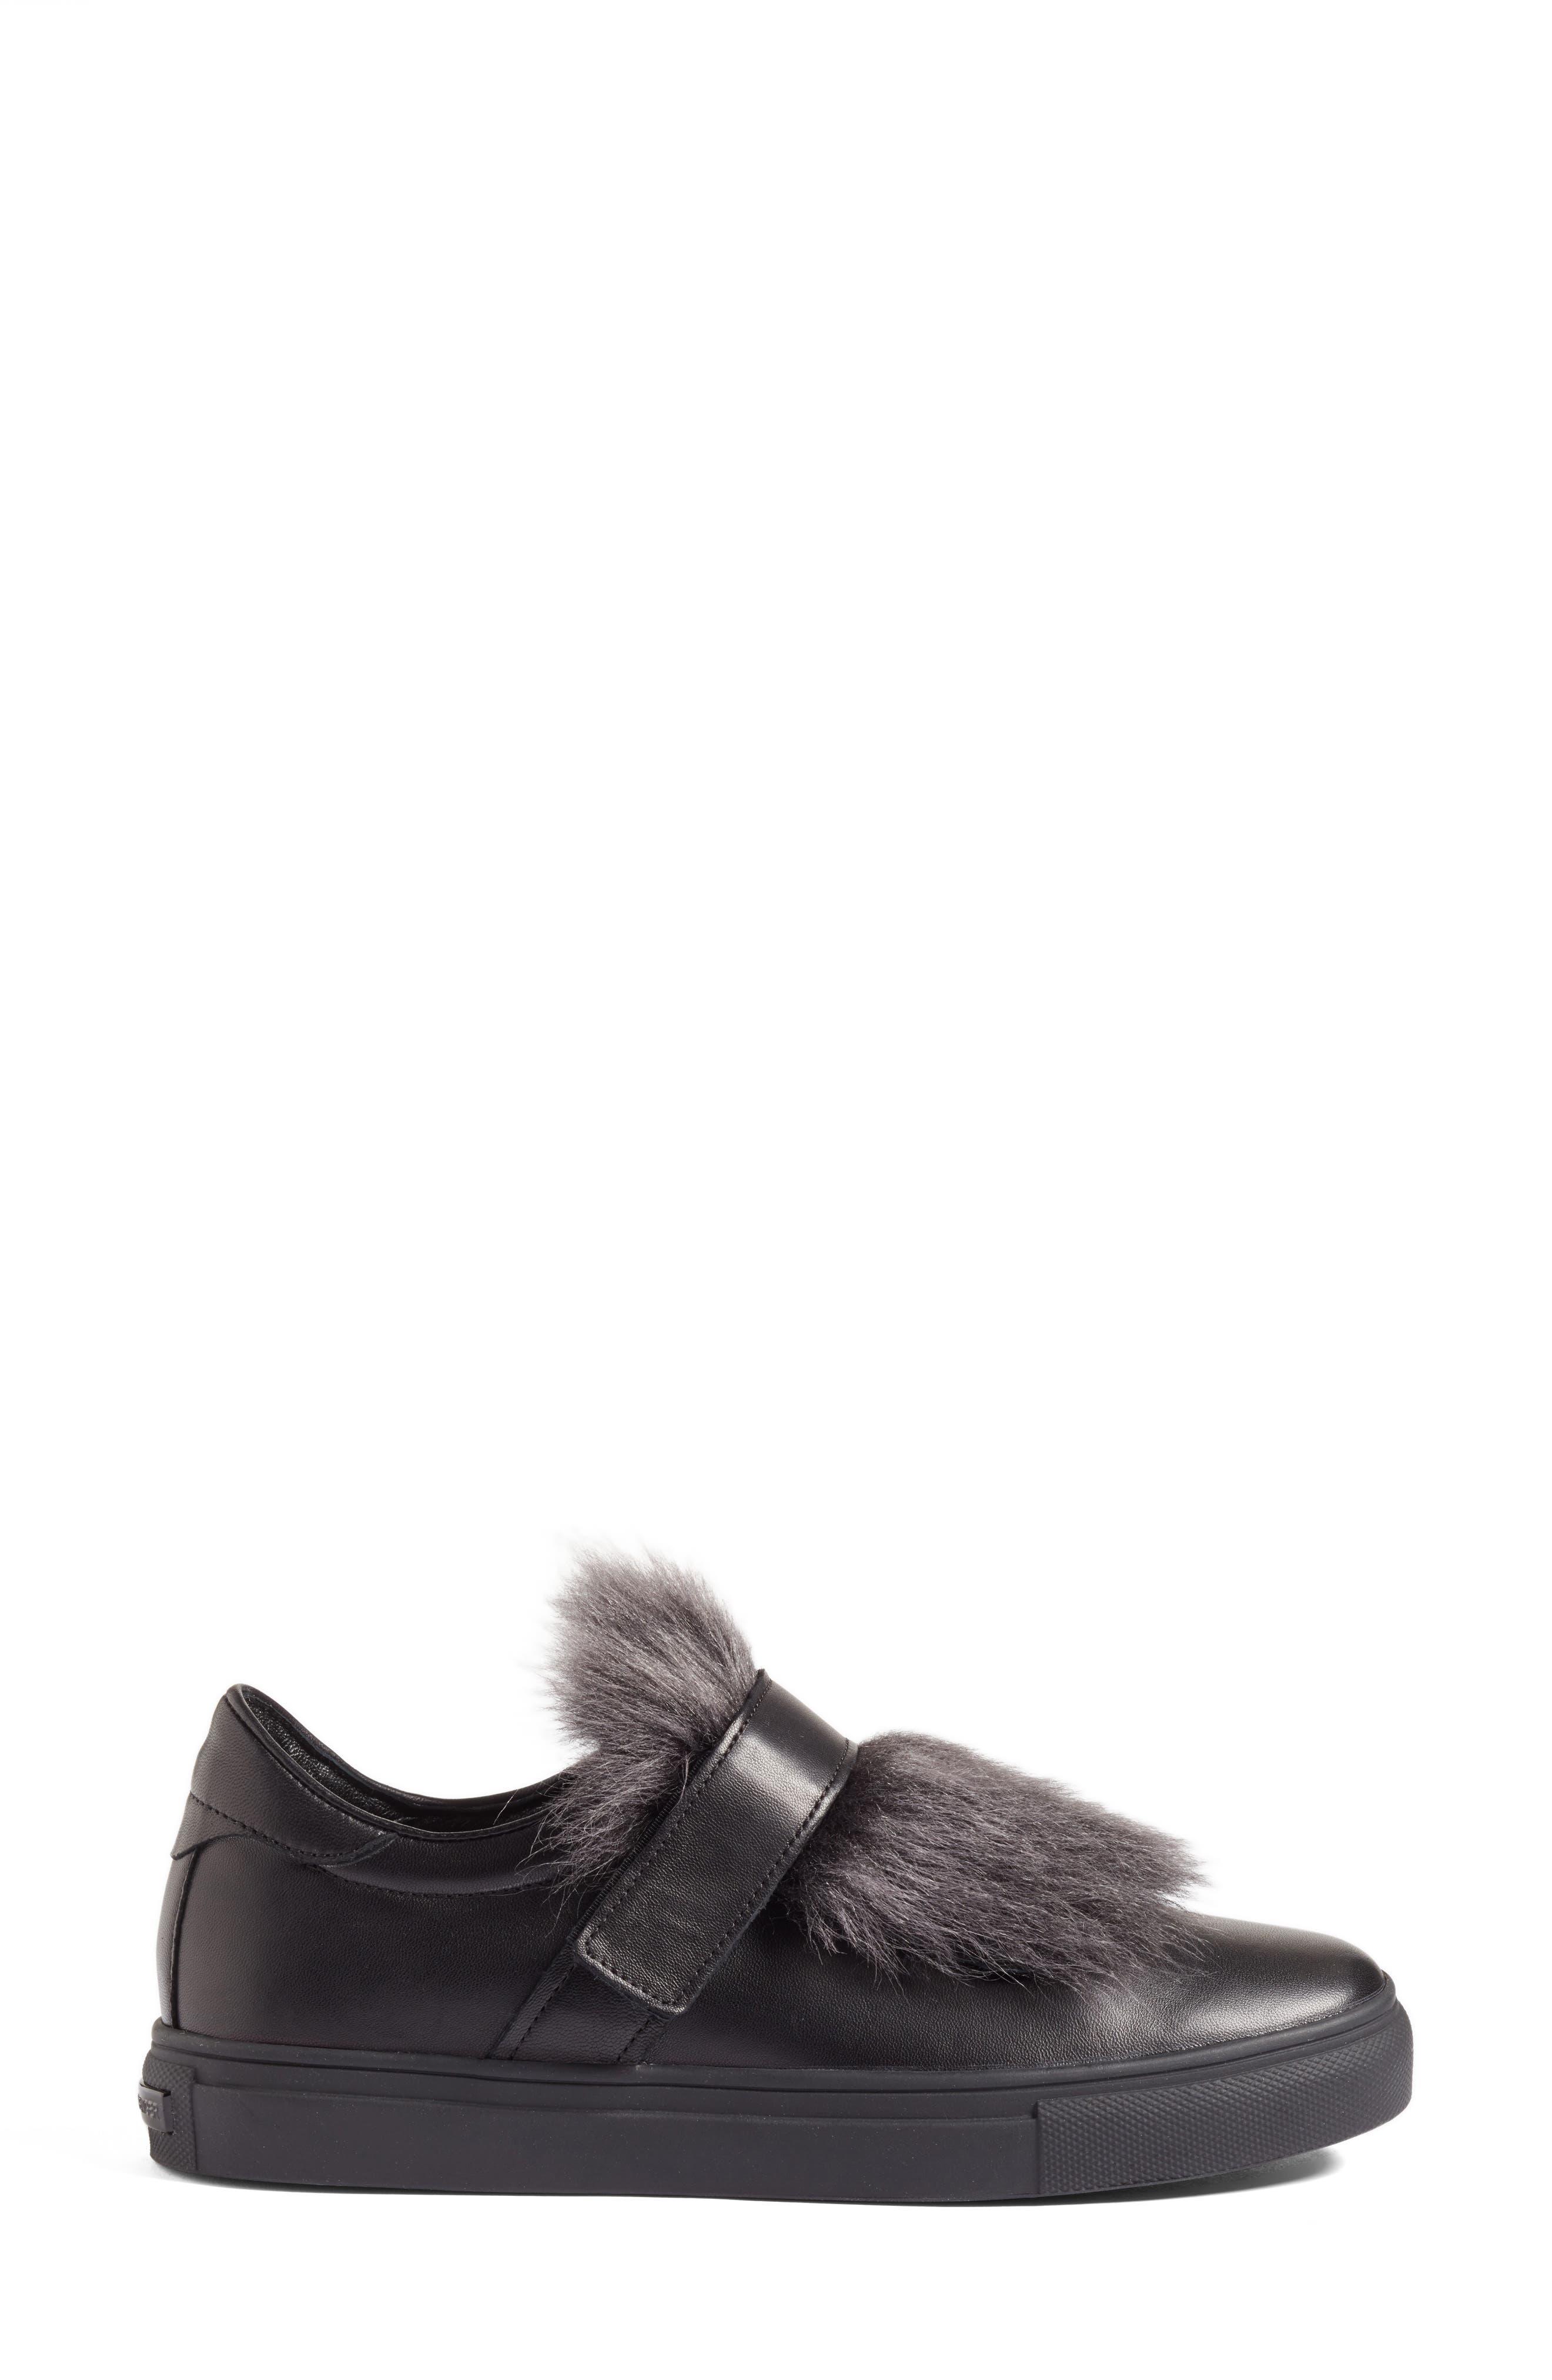 Kennel & Schmenger Basket Slip-On Sneaker with Genuine Shearling Trim,                             Alternate thumbnail 3, color,                             001